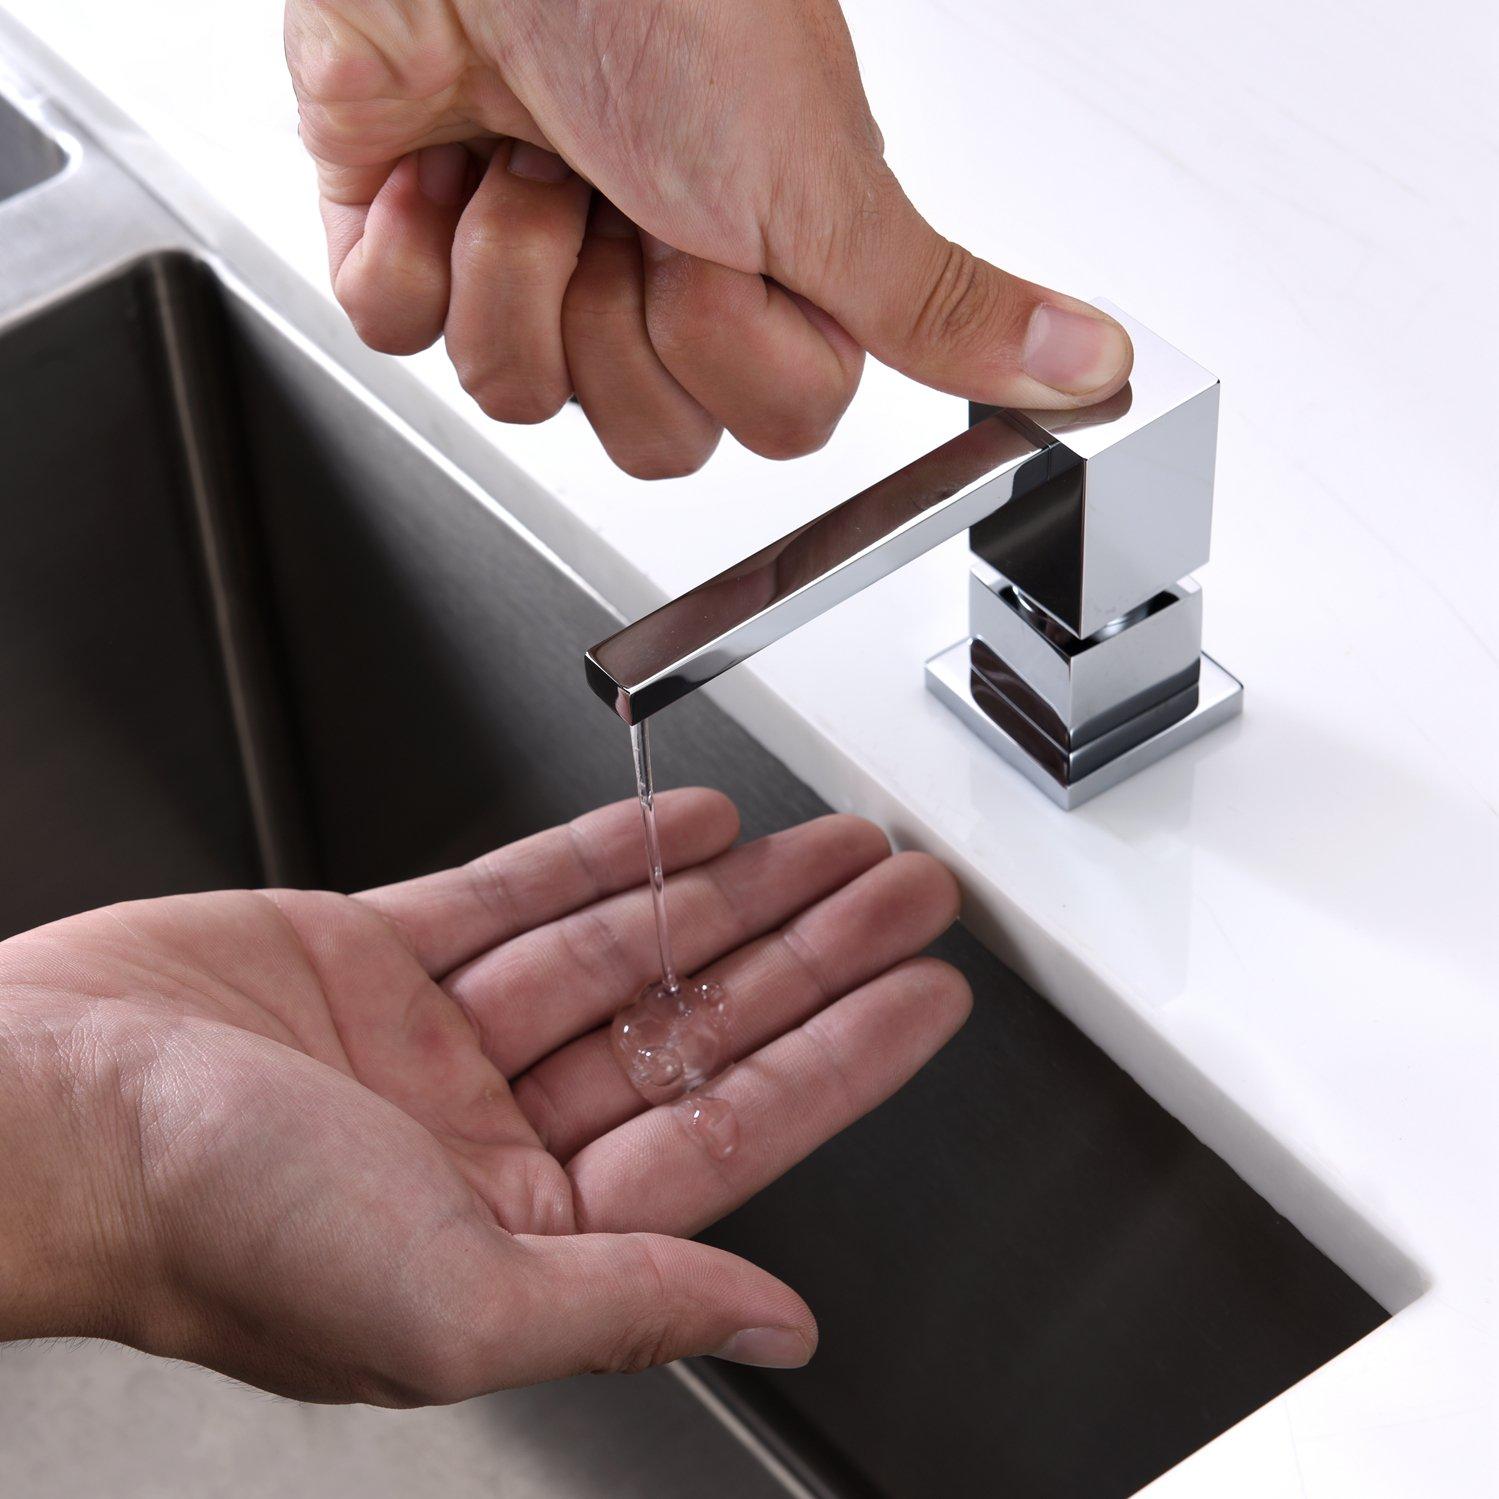 LAZADA Modern Chrome Built in Pump Kitchen Sink Dish Soap Dispenser, Dish Kitchen Soap Dispenser Pump by Fonveth (Image #3)